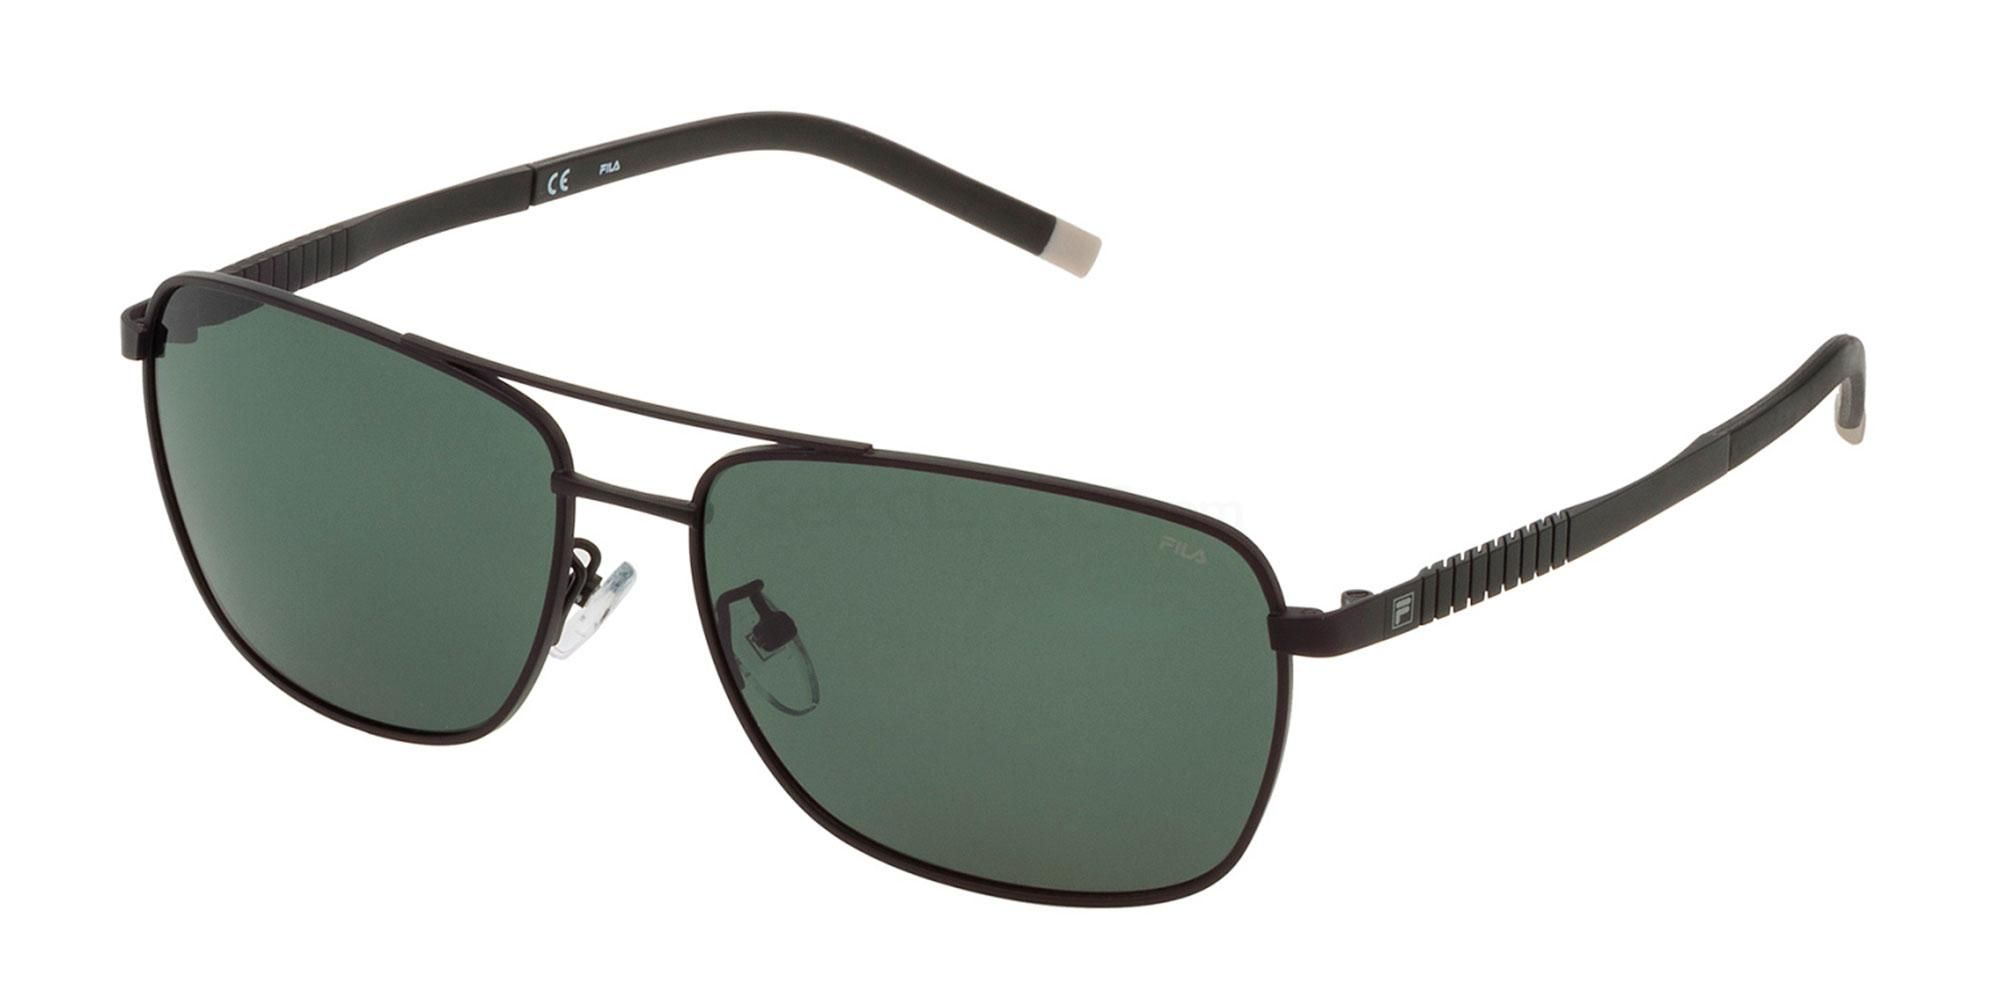 531P SF9921 Sunglasses, Fila